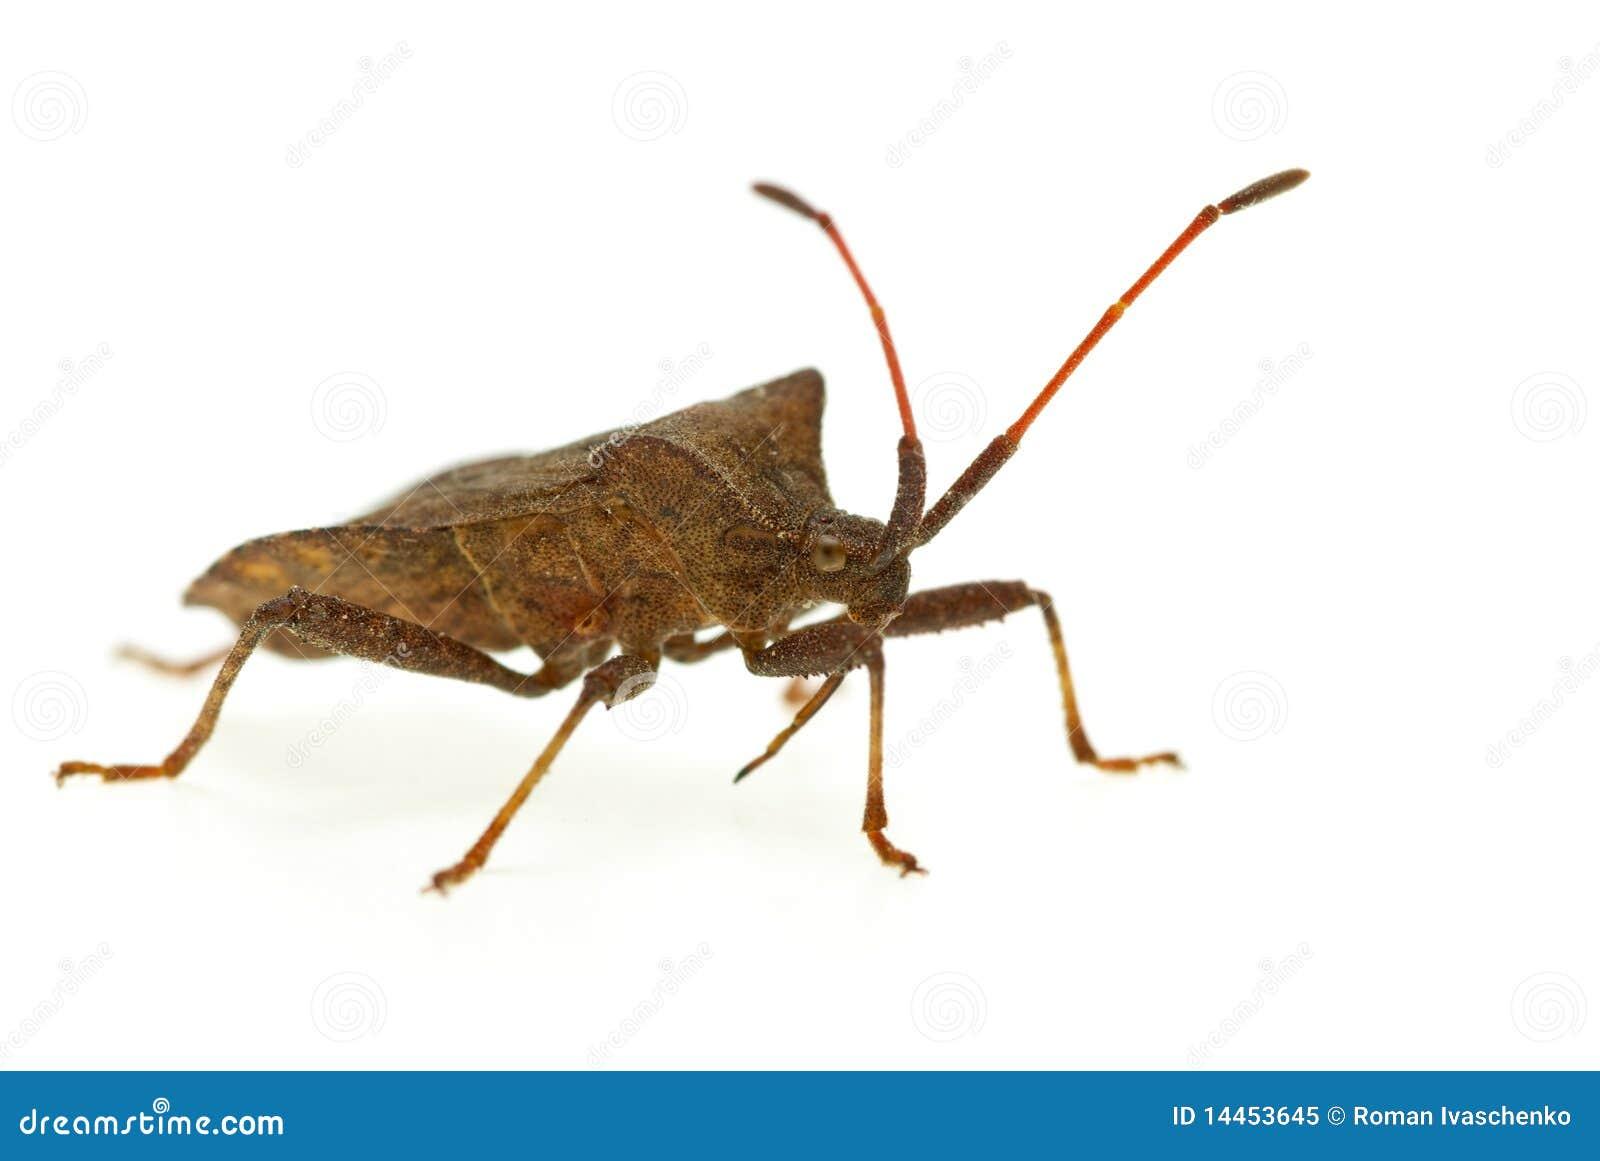 Bidens picromerus stinkbug